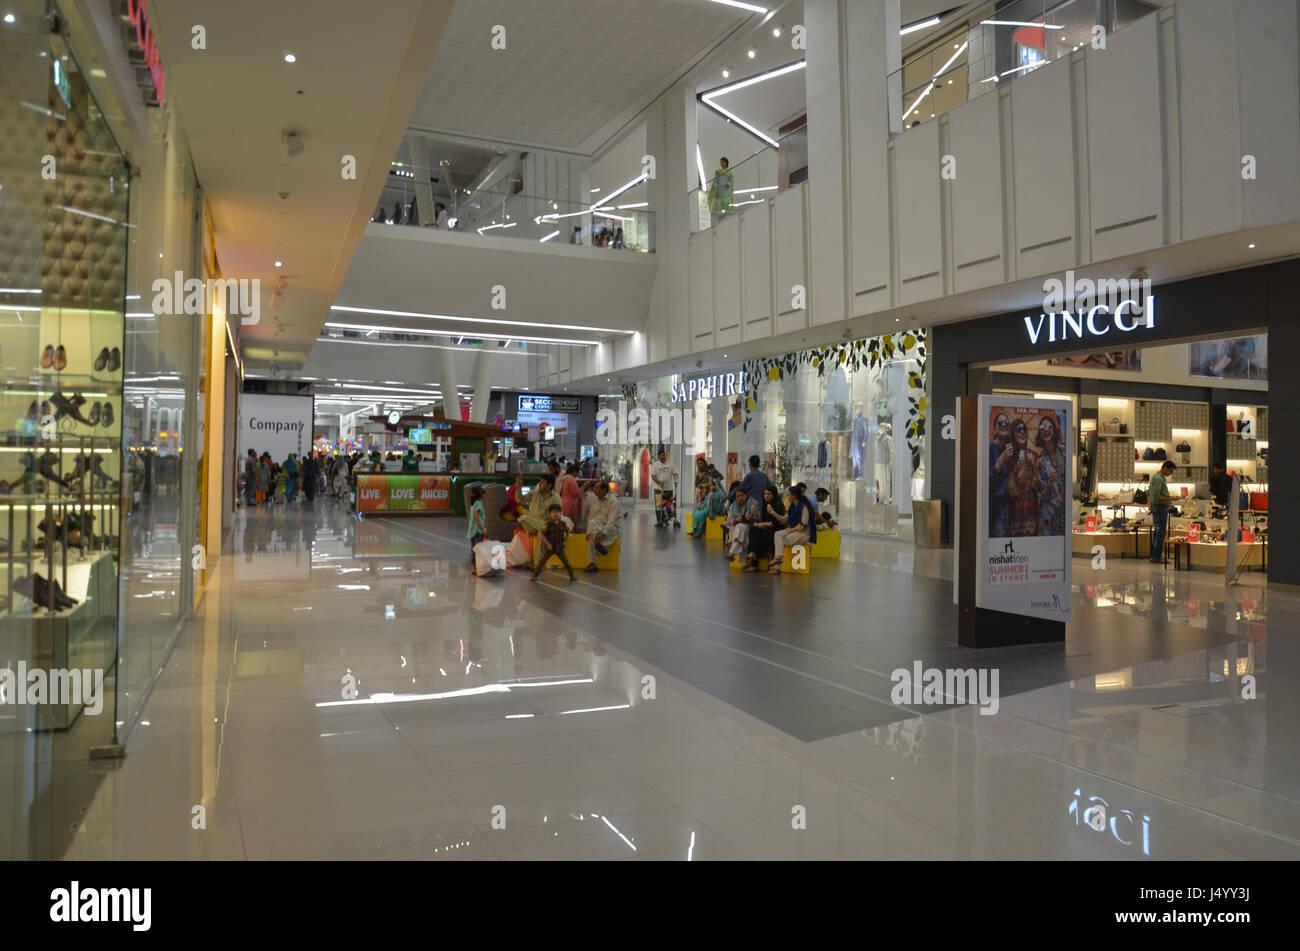 Emporium Shopping Mall, Lahore Pakistan - Stock Image